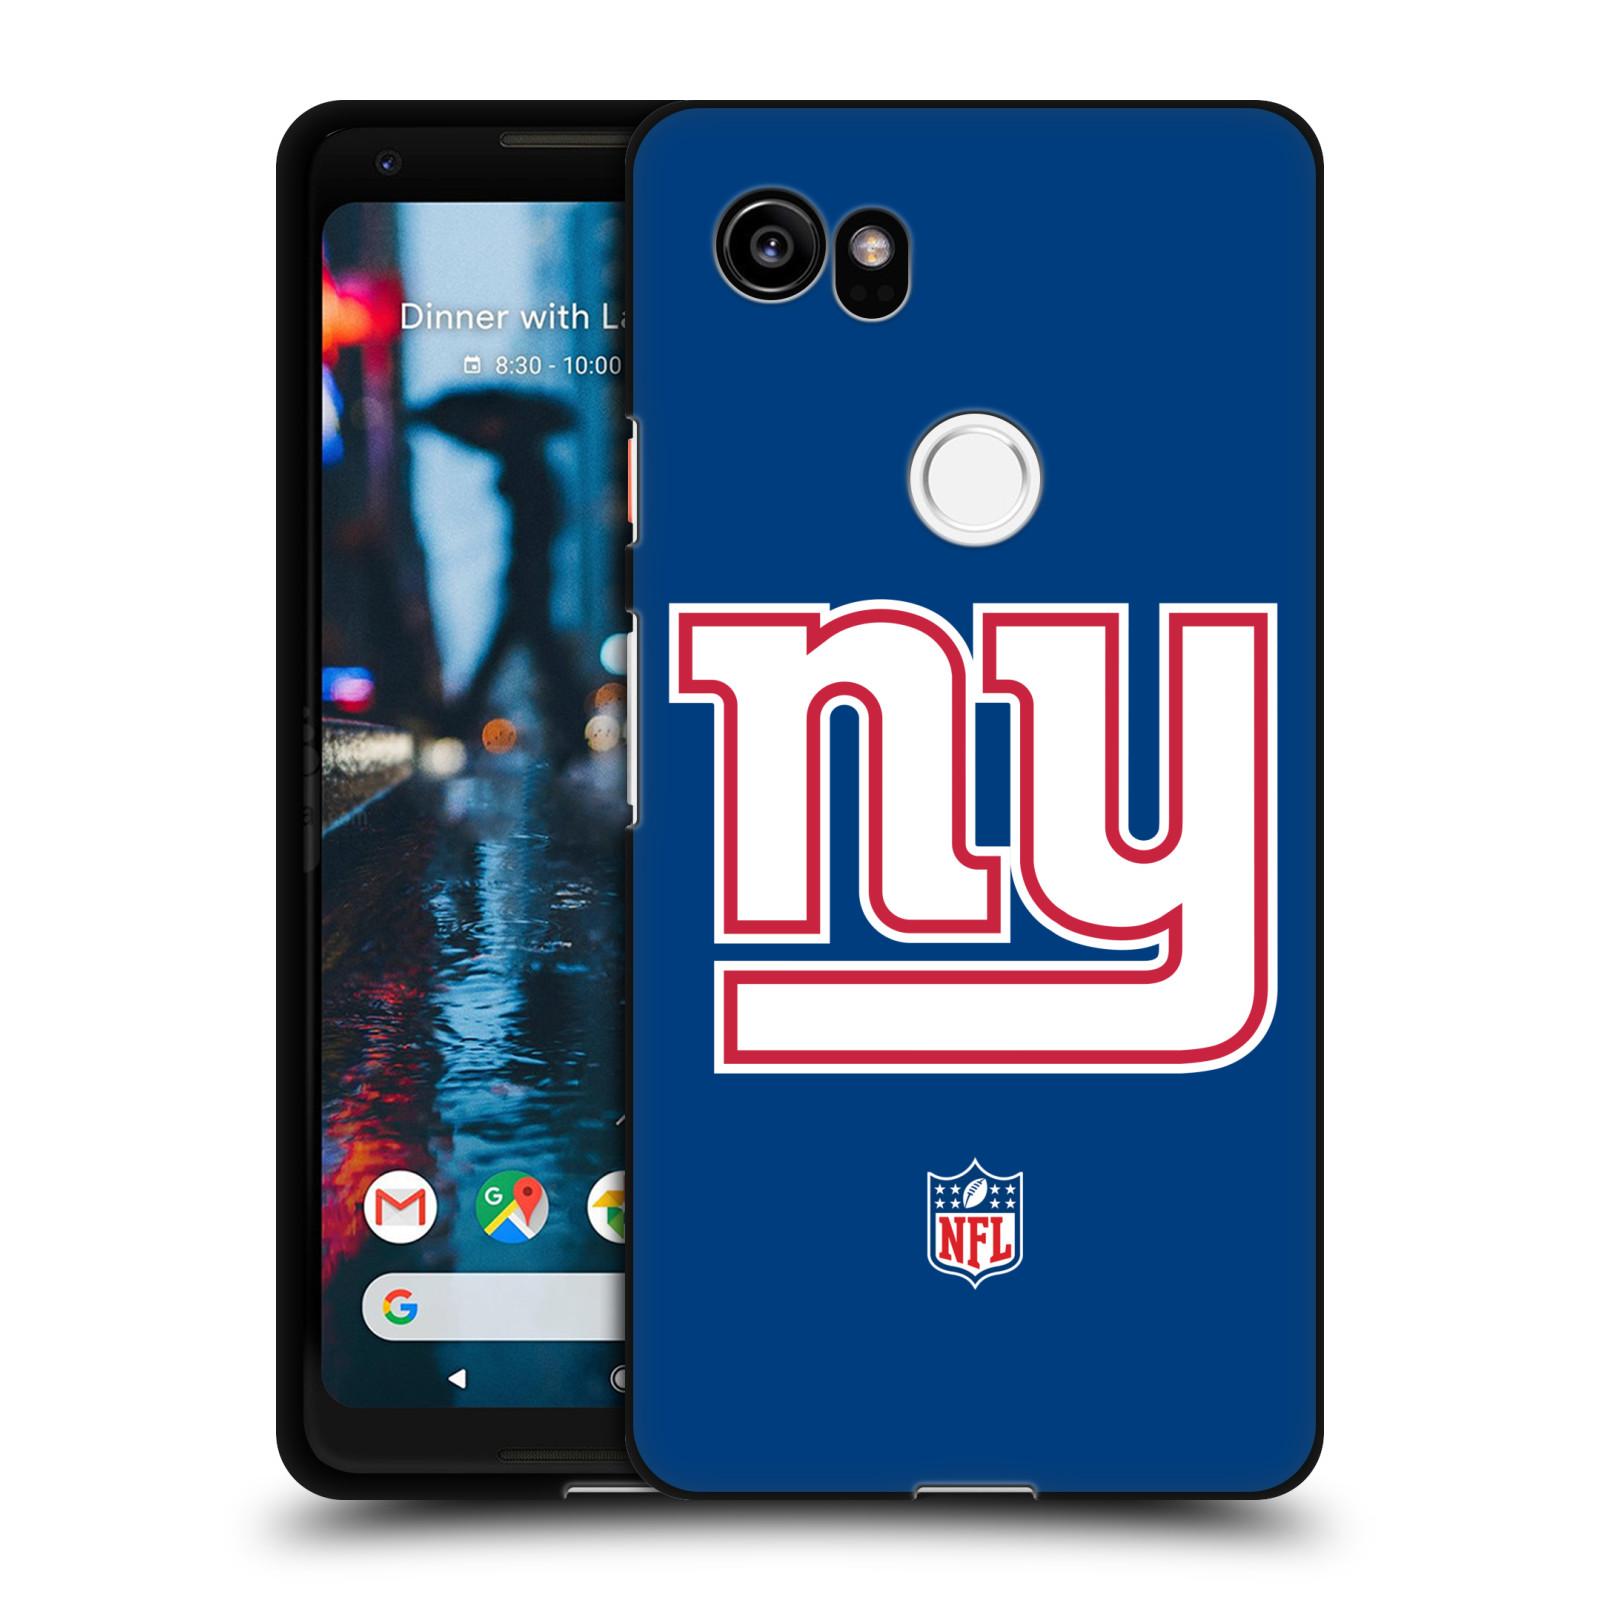 OFFICIAL-NFL-NEW-YORK-GIANTS-LOGO-BLACK-SOFT-GEL-CASE-FOR-GOOGLE-PHONES